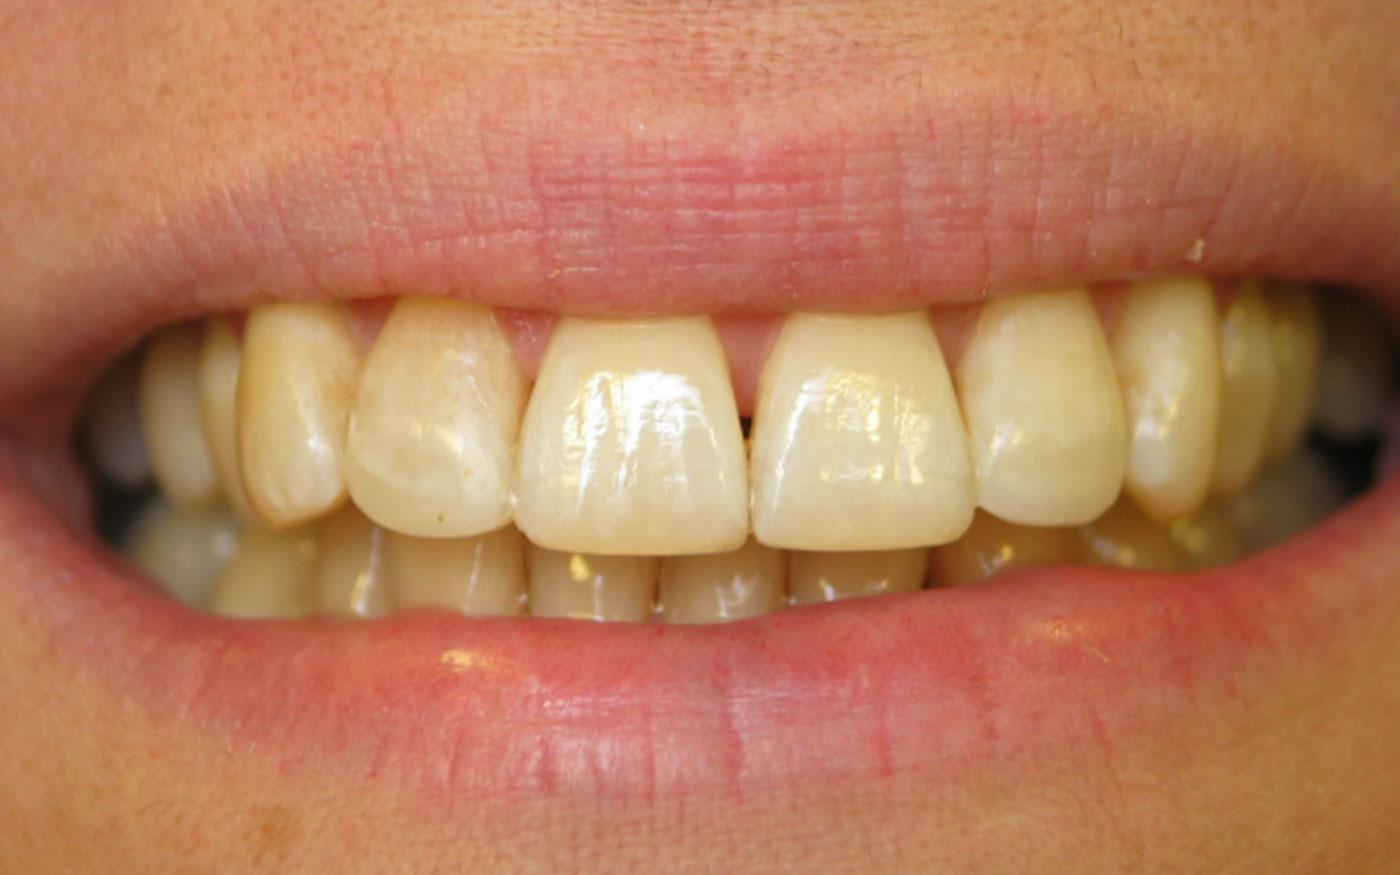 Orthodontics - Inman Aligner - Case 7